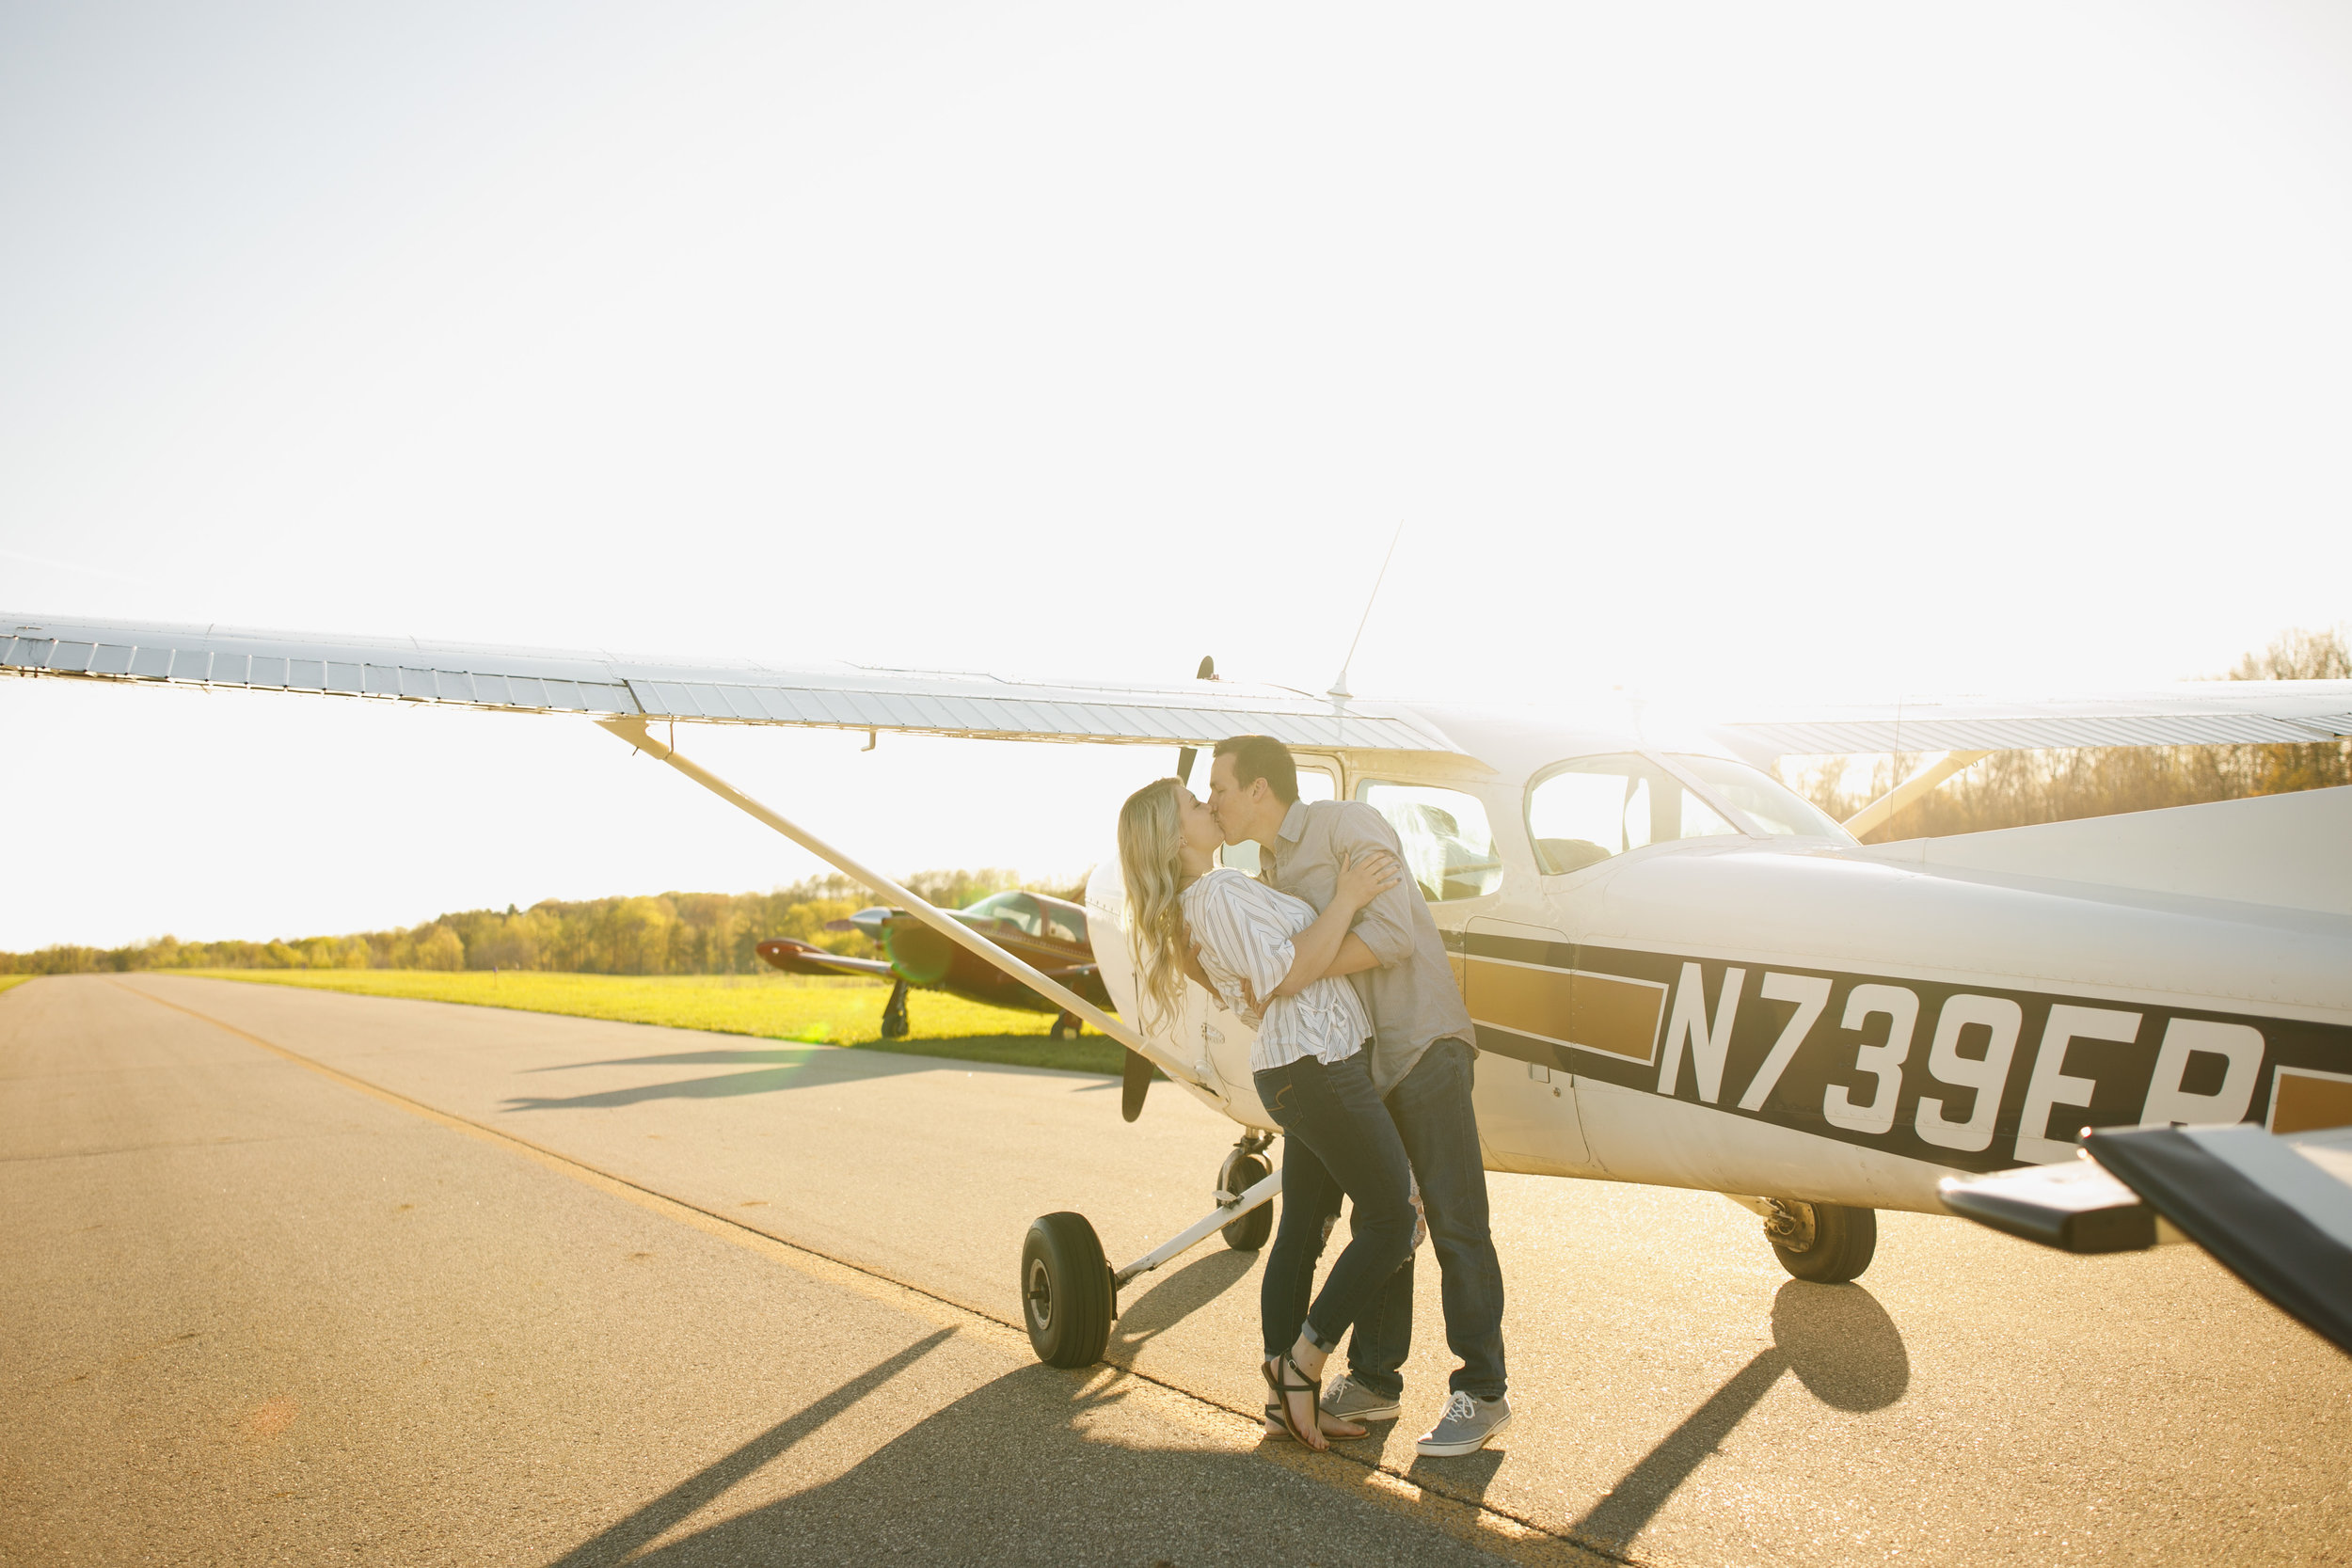 Grand Rapids Photographer - J Darling Photo - jessica darling - grand rapids wedding photographer - sparta airport - sparta michigan - jasmine and jeff engaged 020.jpg